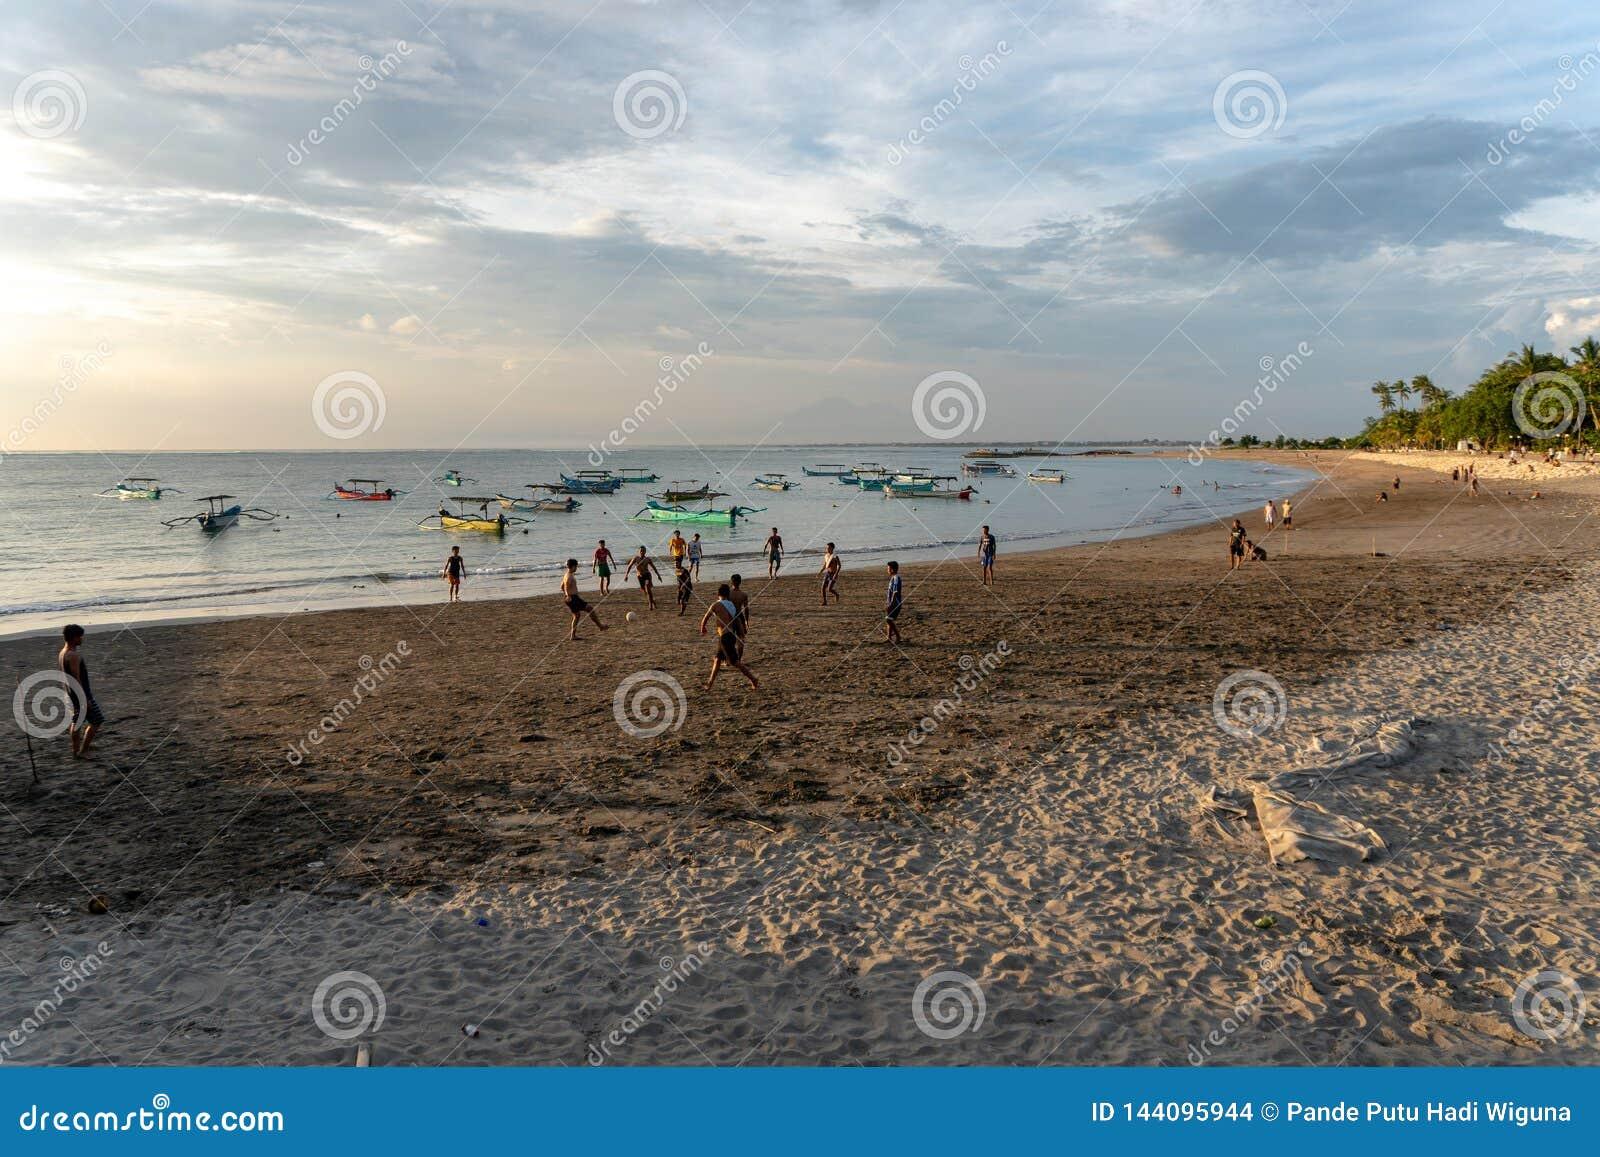 BADUNG,BALI/INDONESIA-APRIL 02 2019年:亚洲少年戏剧橄榄球或足球在海滩与日落或金黄小时背景